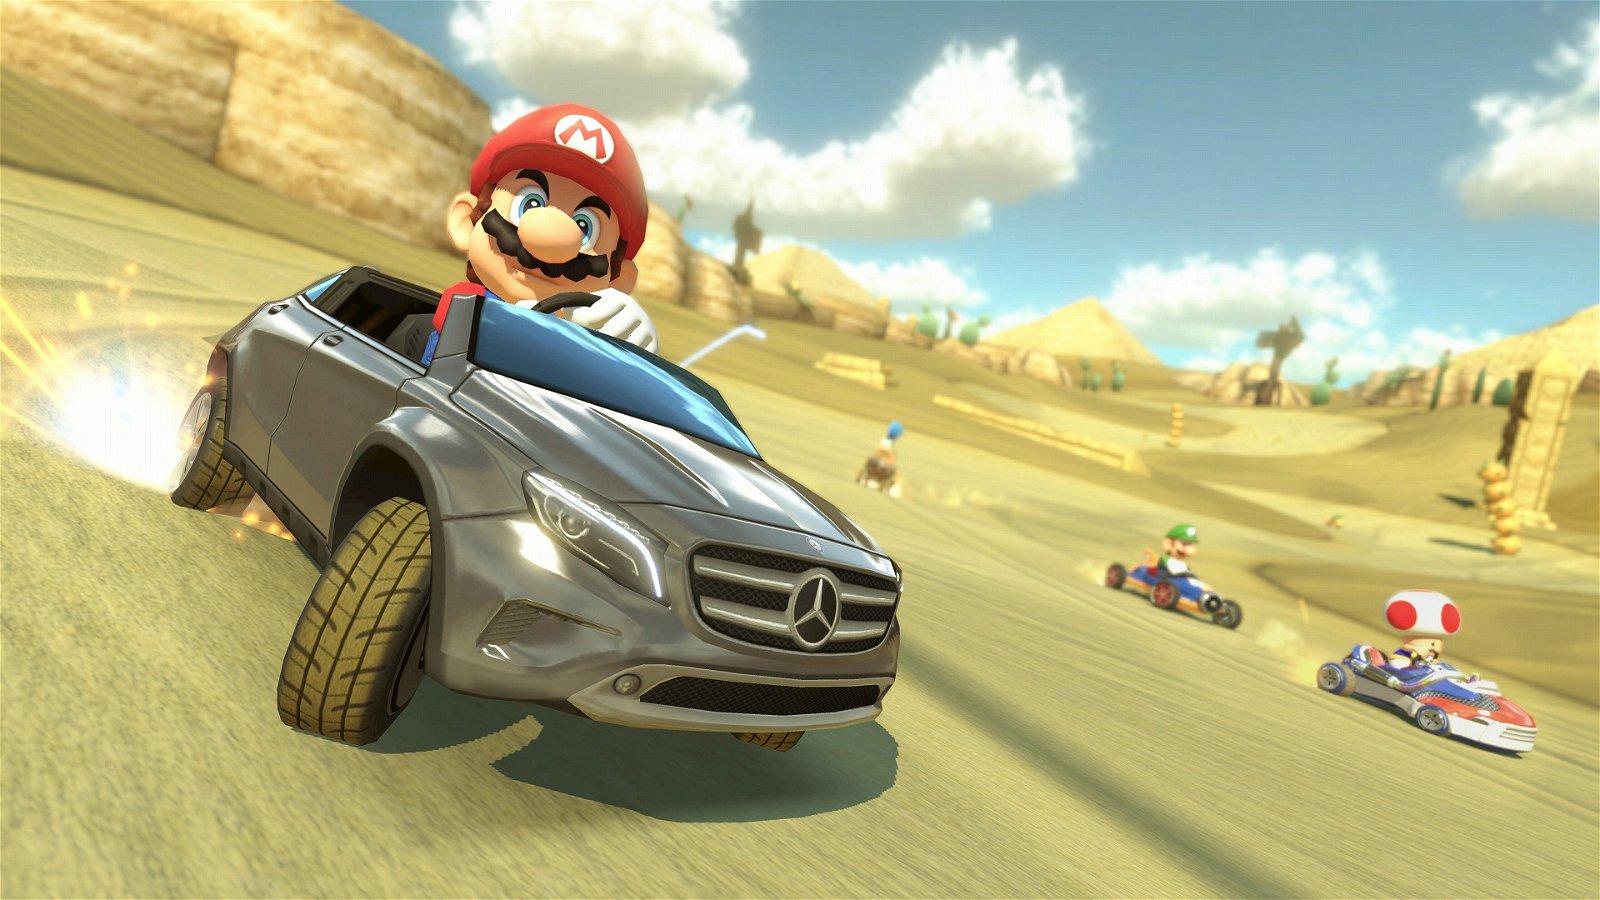 Mario Kart 8 Dlc Announced - 2014-05-29 10:04:13